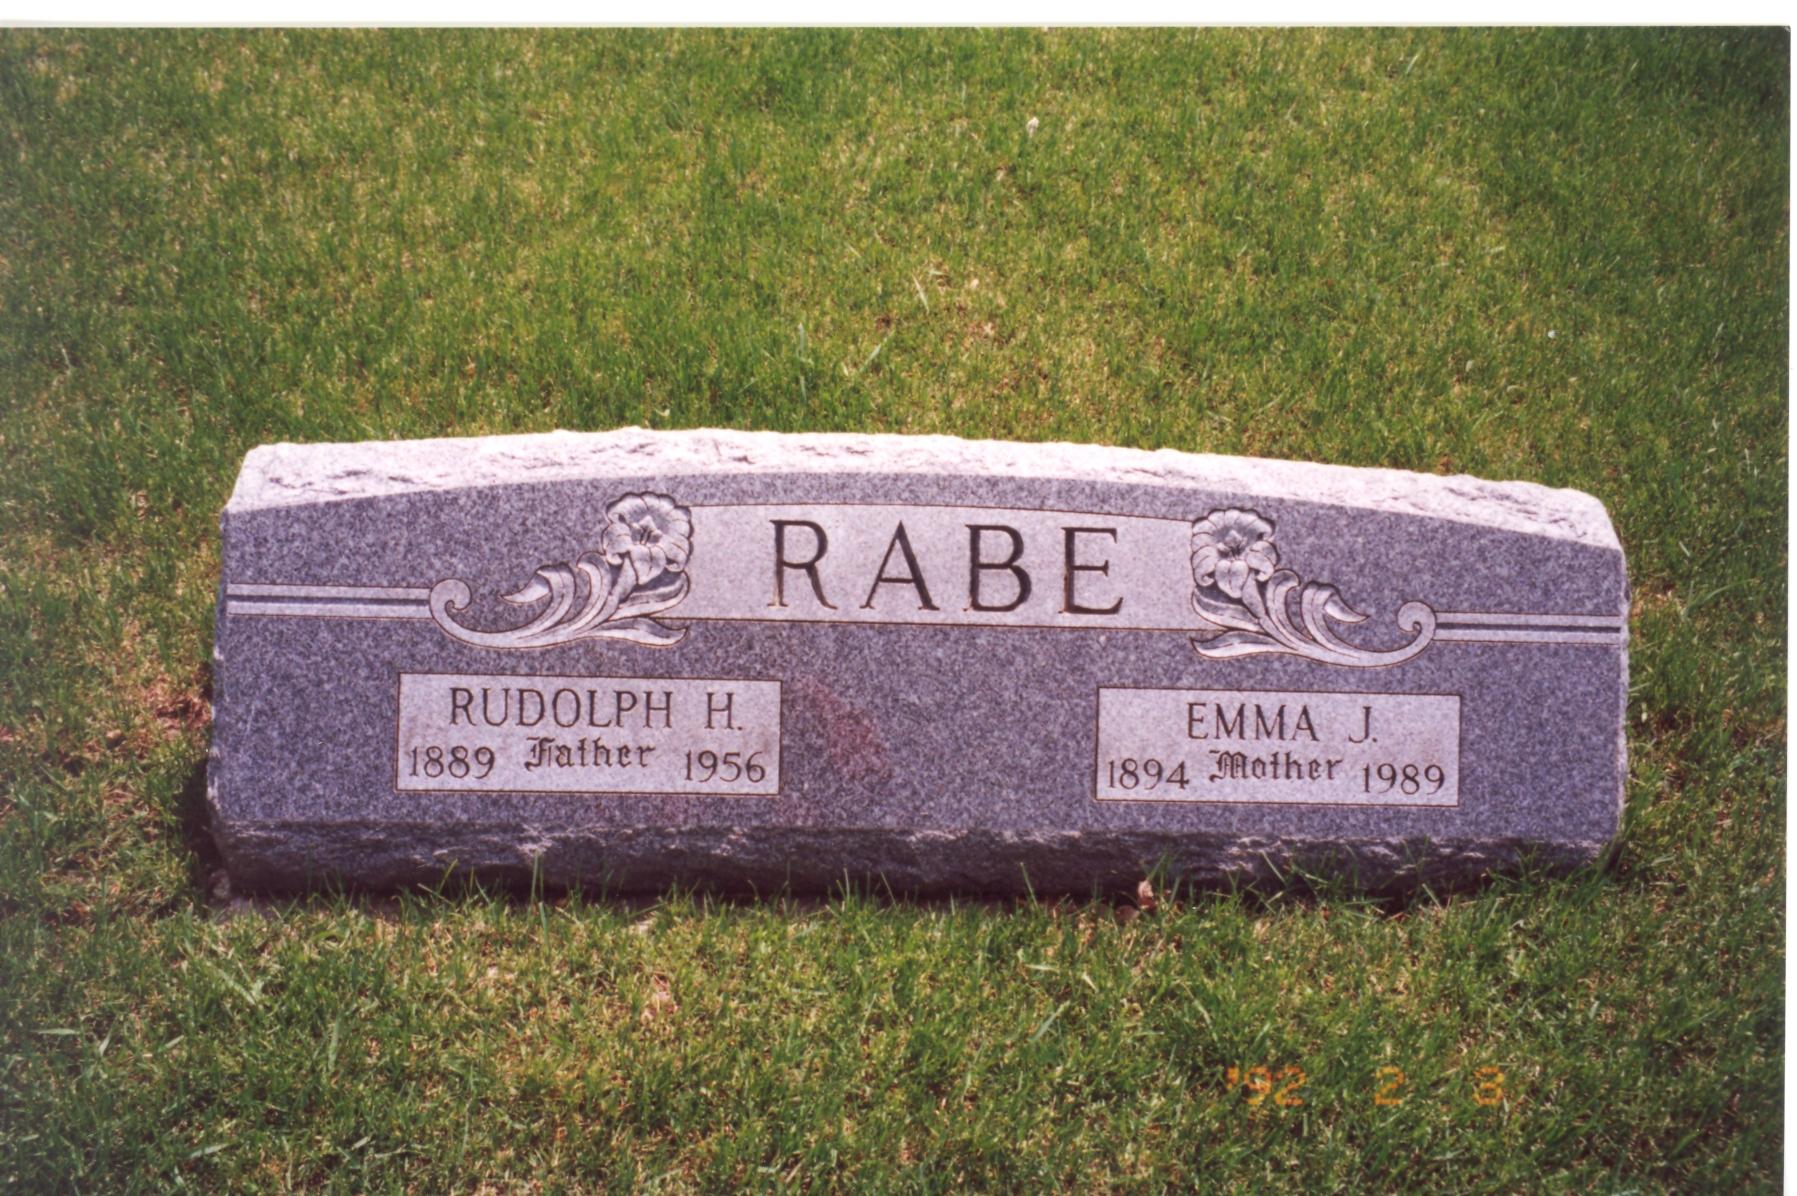 Rudolph Rabe